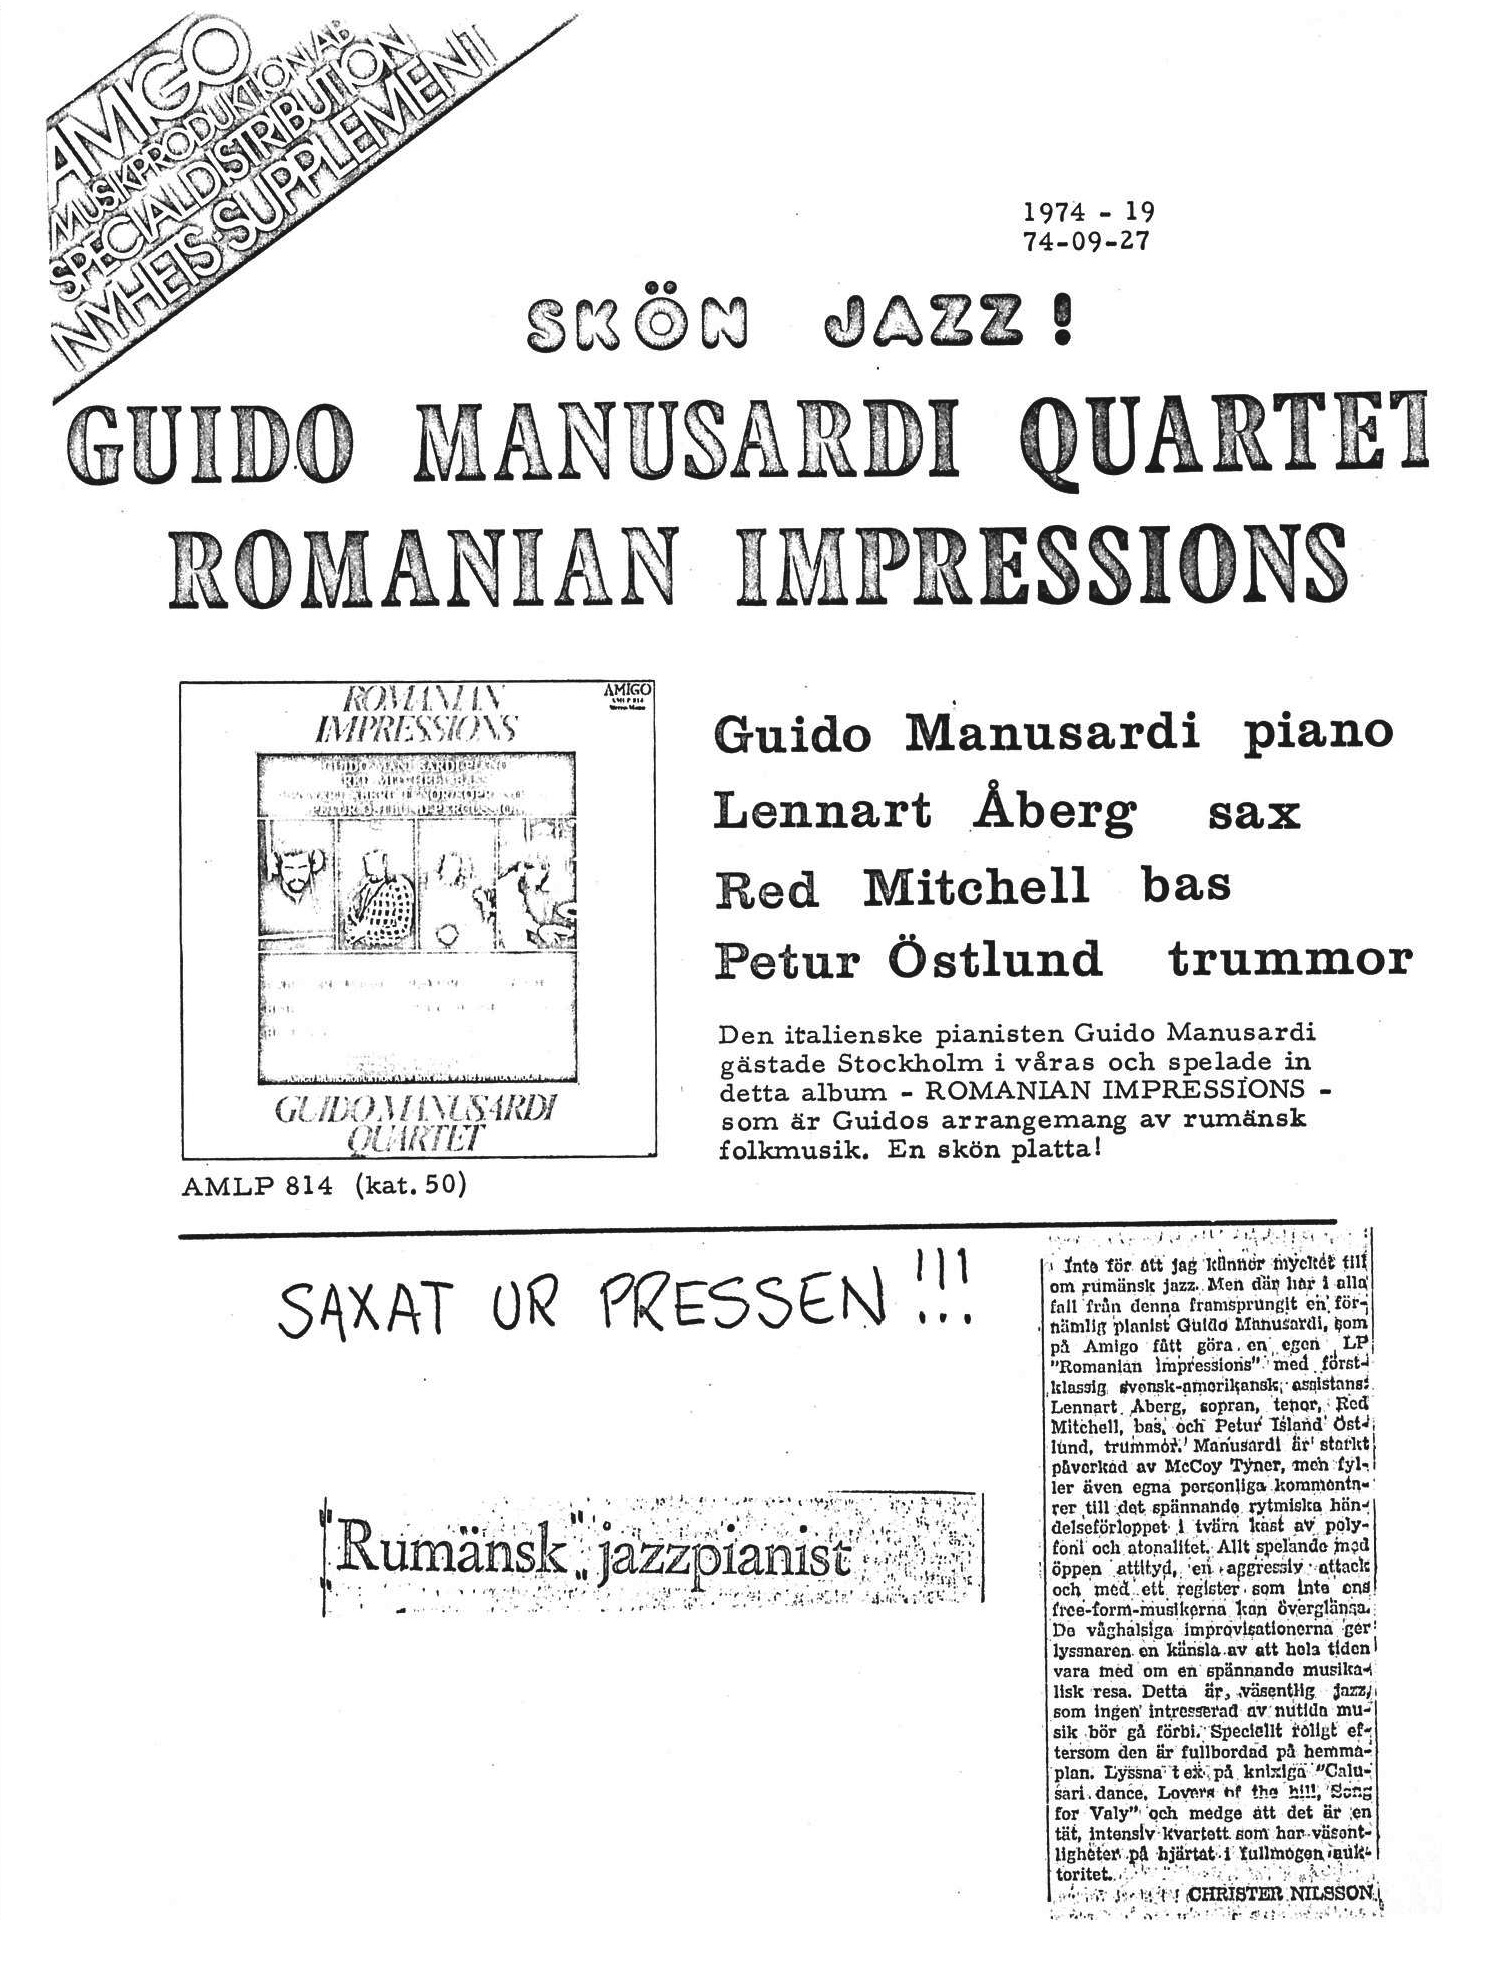 ROMANIAN IMPRESSION 1974